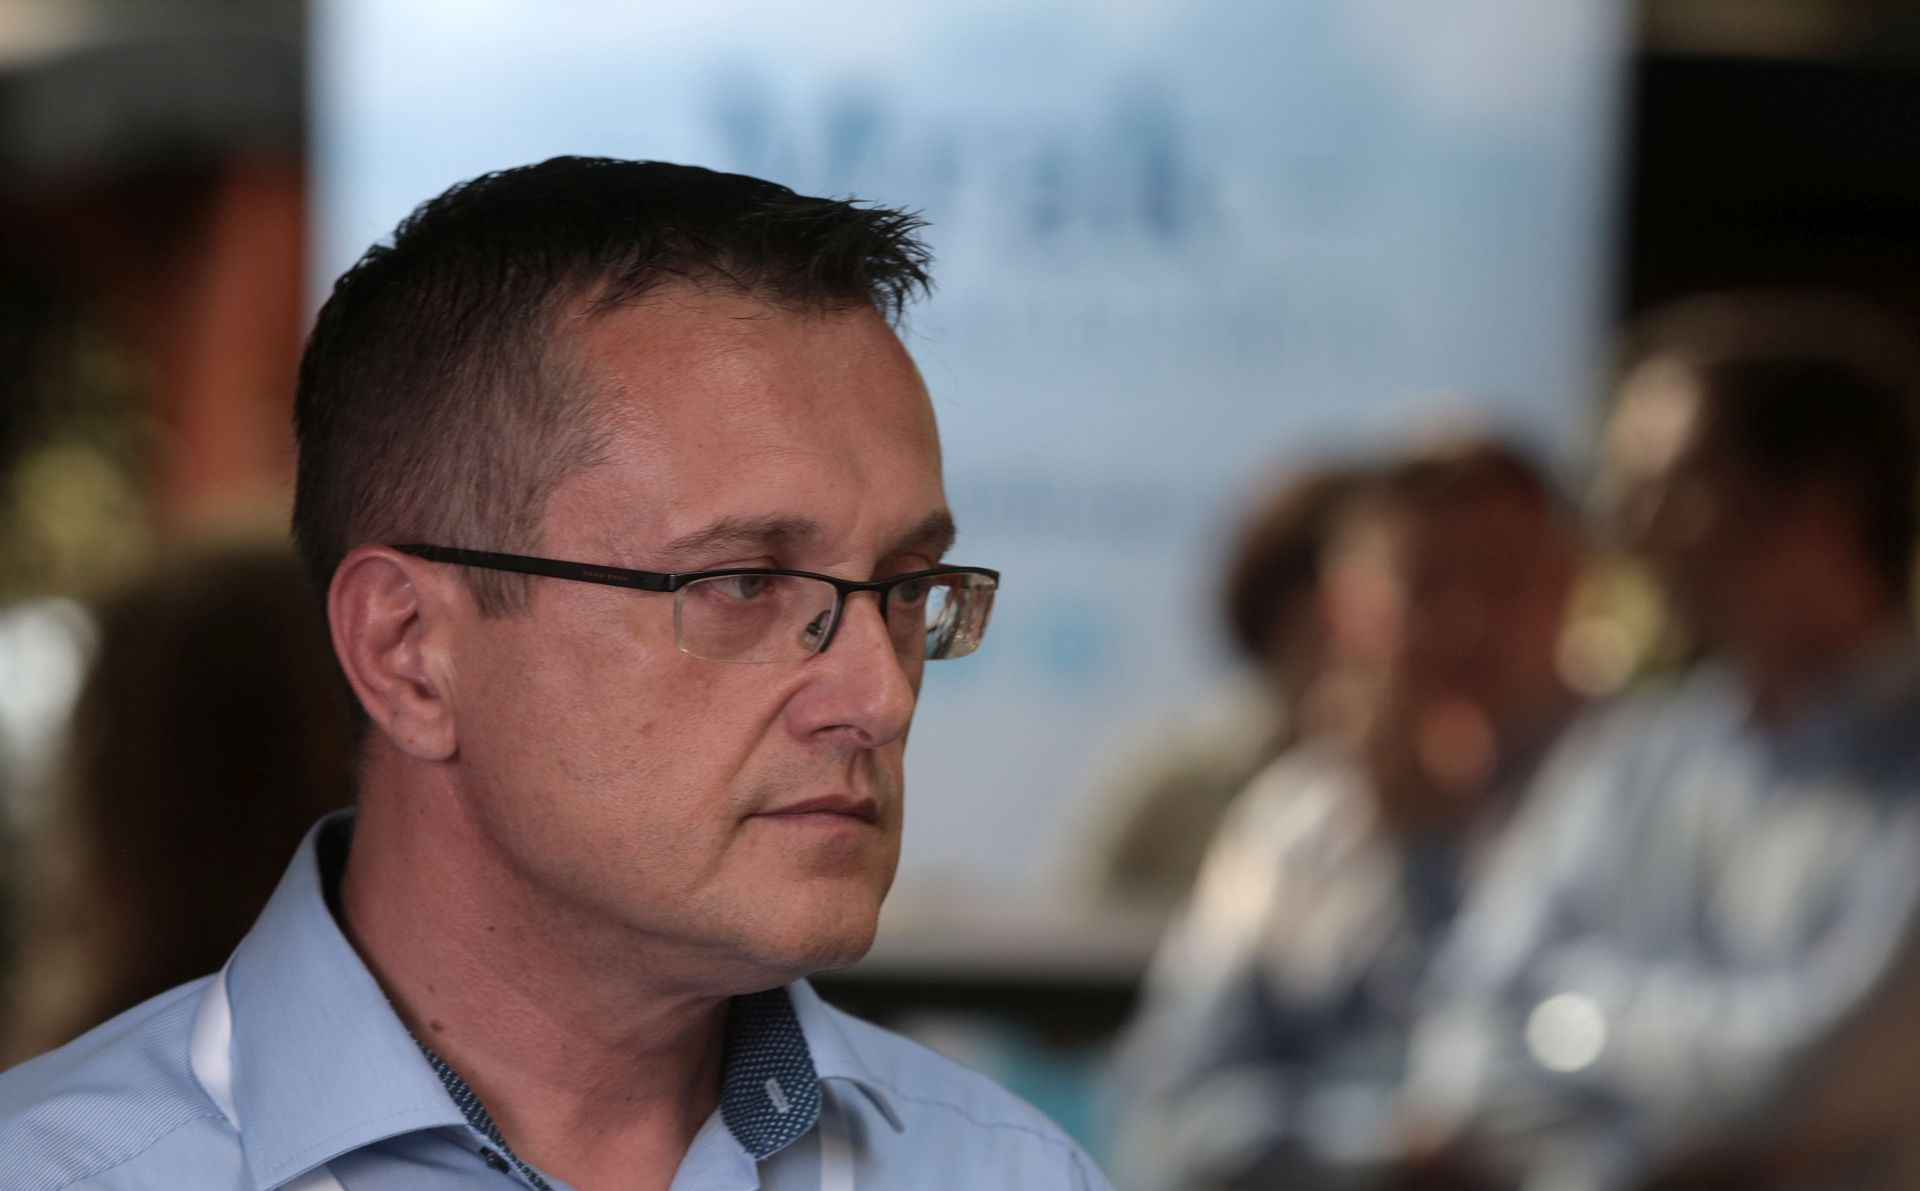 BEUS RICHEMBERG 'Rezultat HNS-a lošiji zbog 'kobnih špekulacija' o ulasku u vladu HDZ-a'